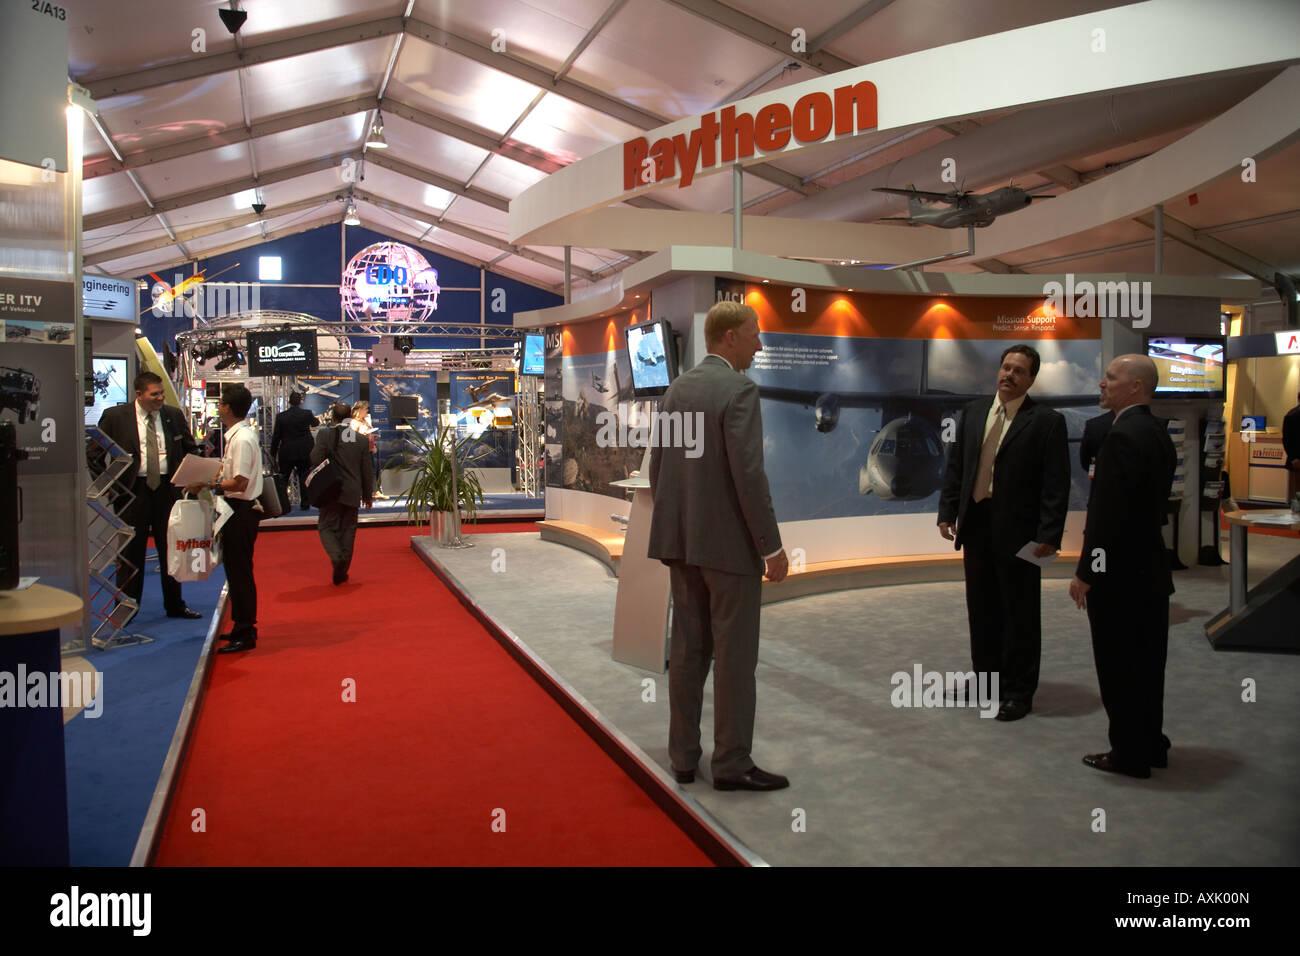 Raytheon and EDO exhibition display trade stand at Farnborough International Airshow July 2006 - Stock Image